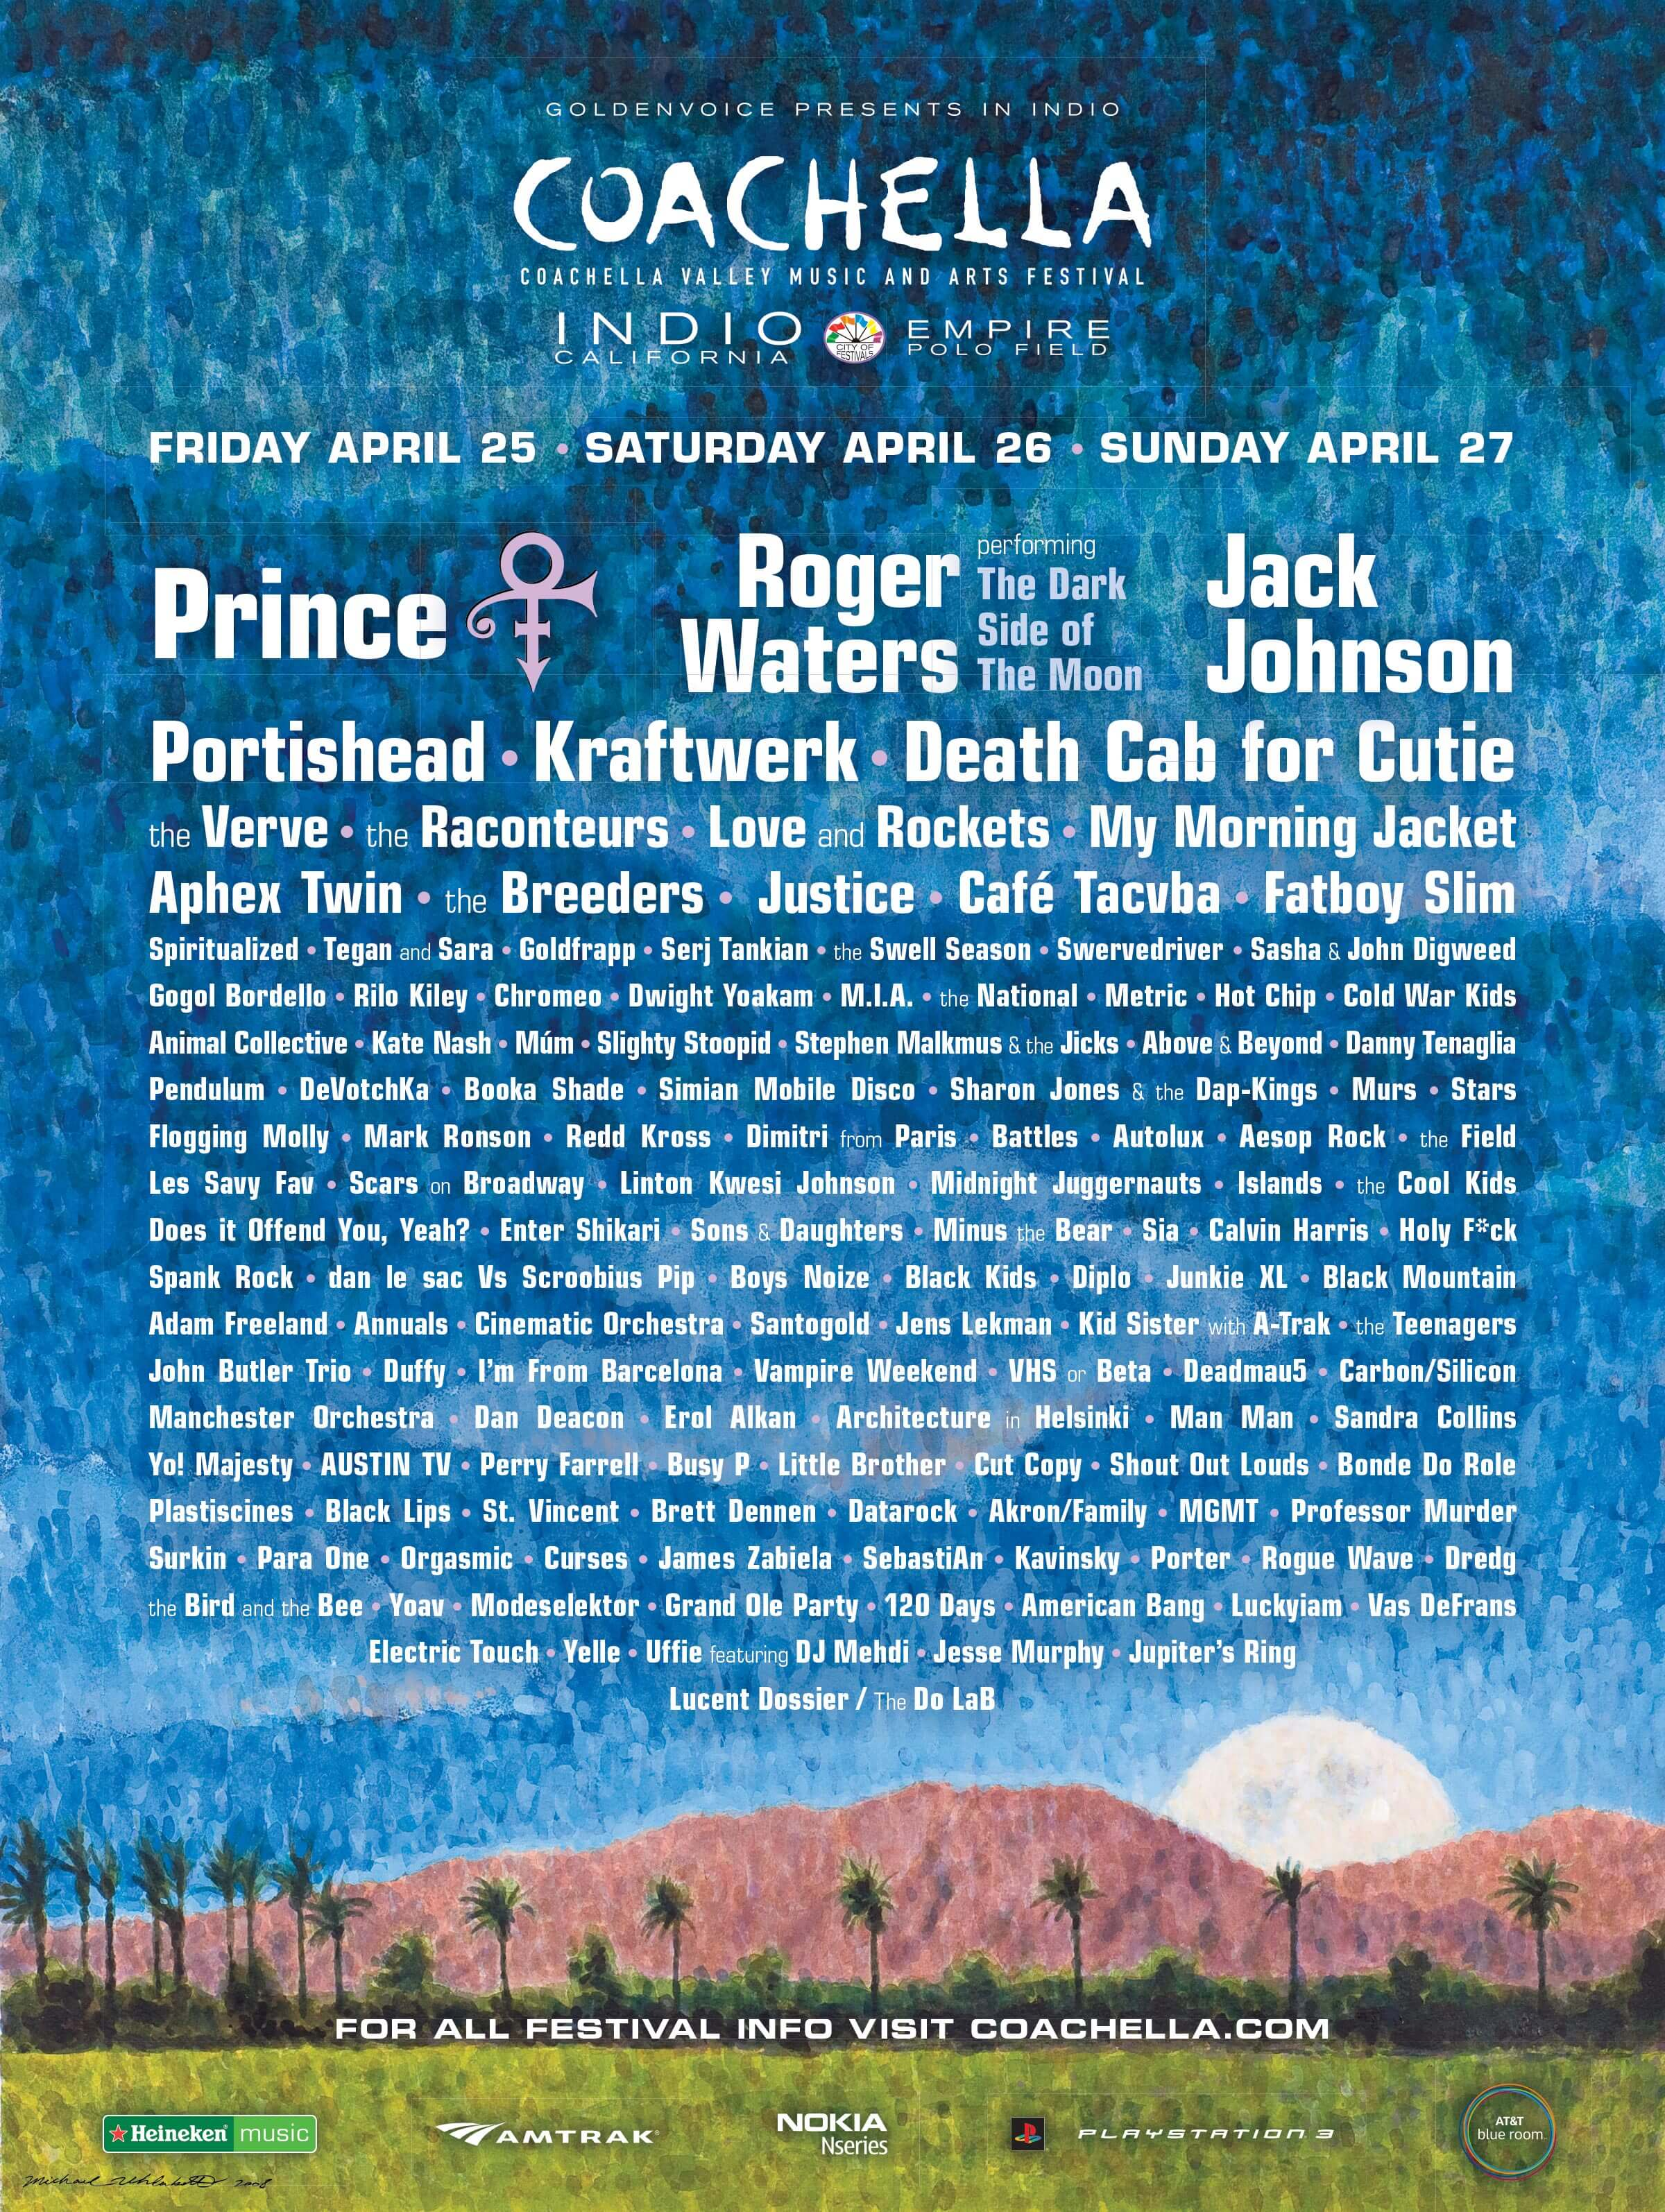 Coachella 2008 Lineup Poster